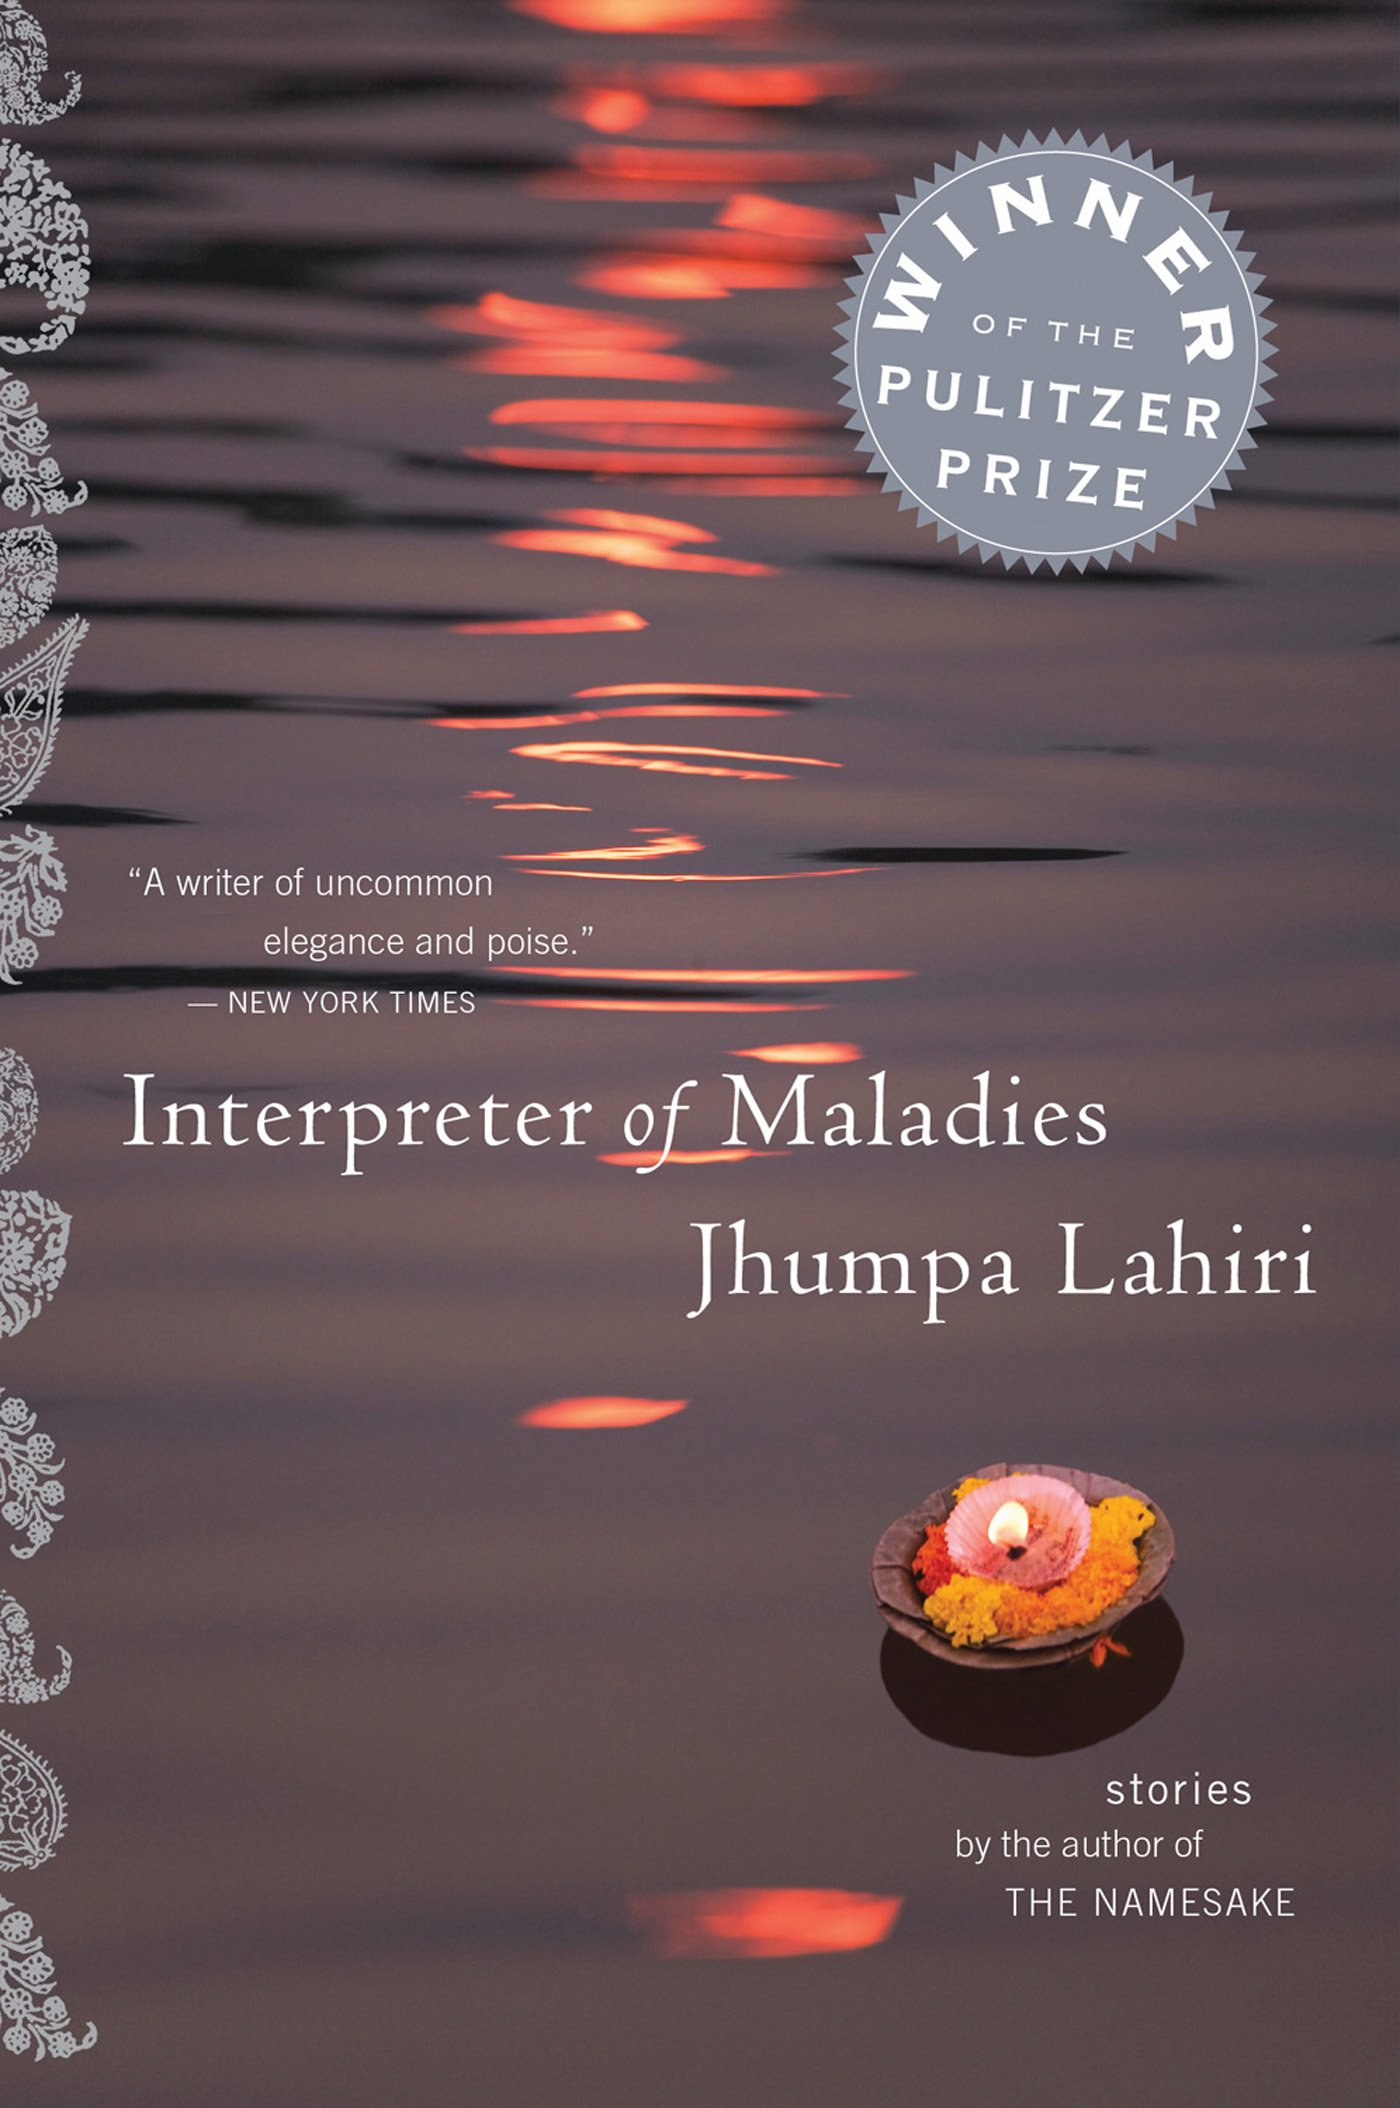 Copy of Interpreter of Maladies